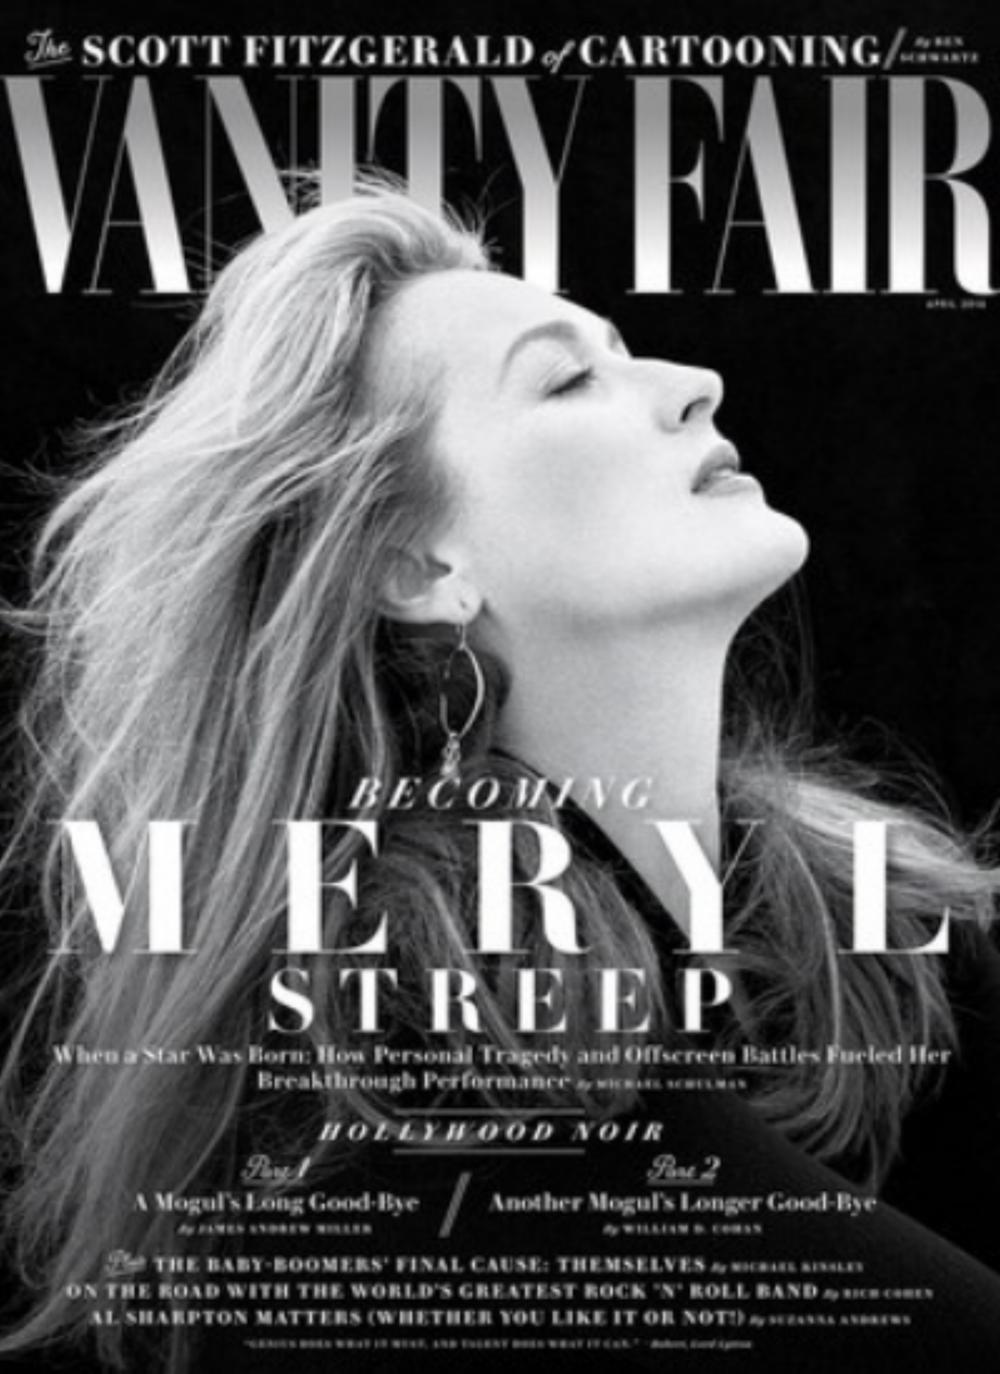 vanity fair - women's / culture